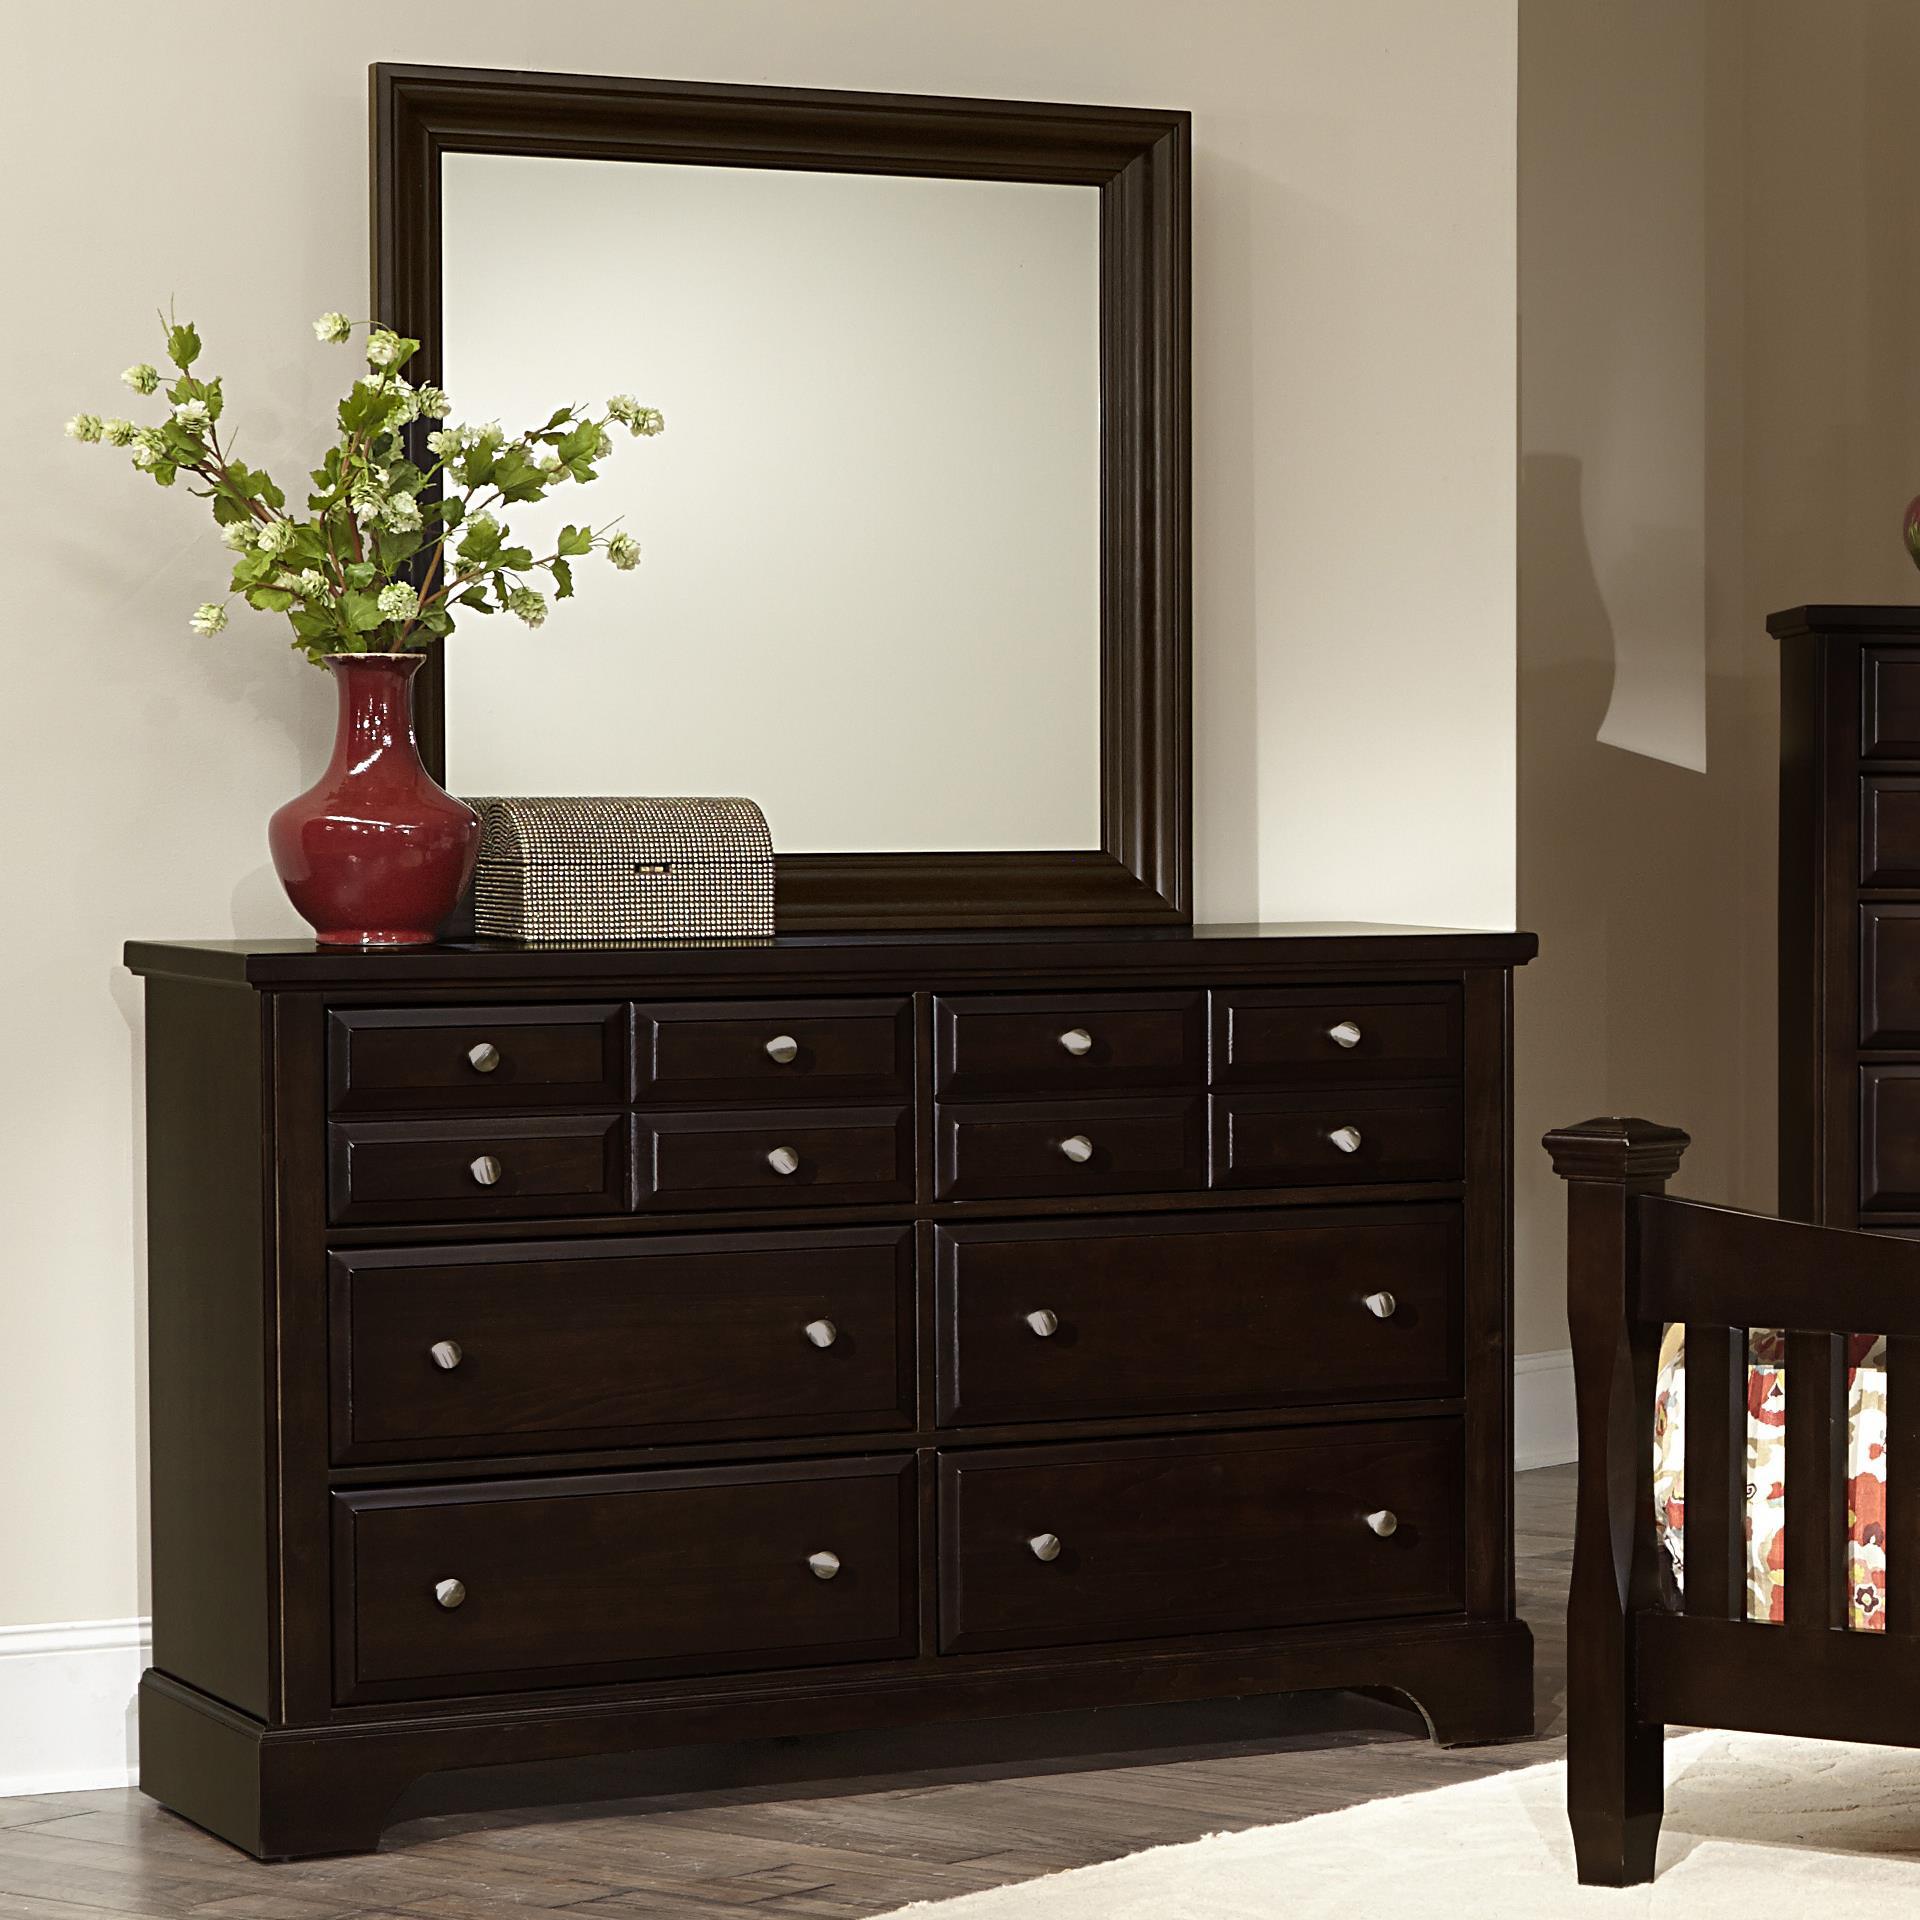 Vaughan Bassett Bedford Dresser - 6 drawers & Landscape Mirror - Item Number: BB88-002+445